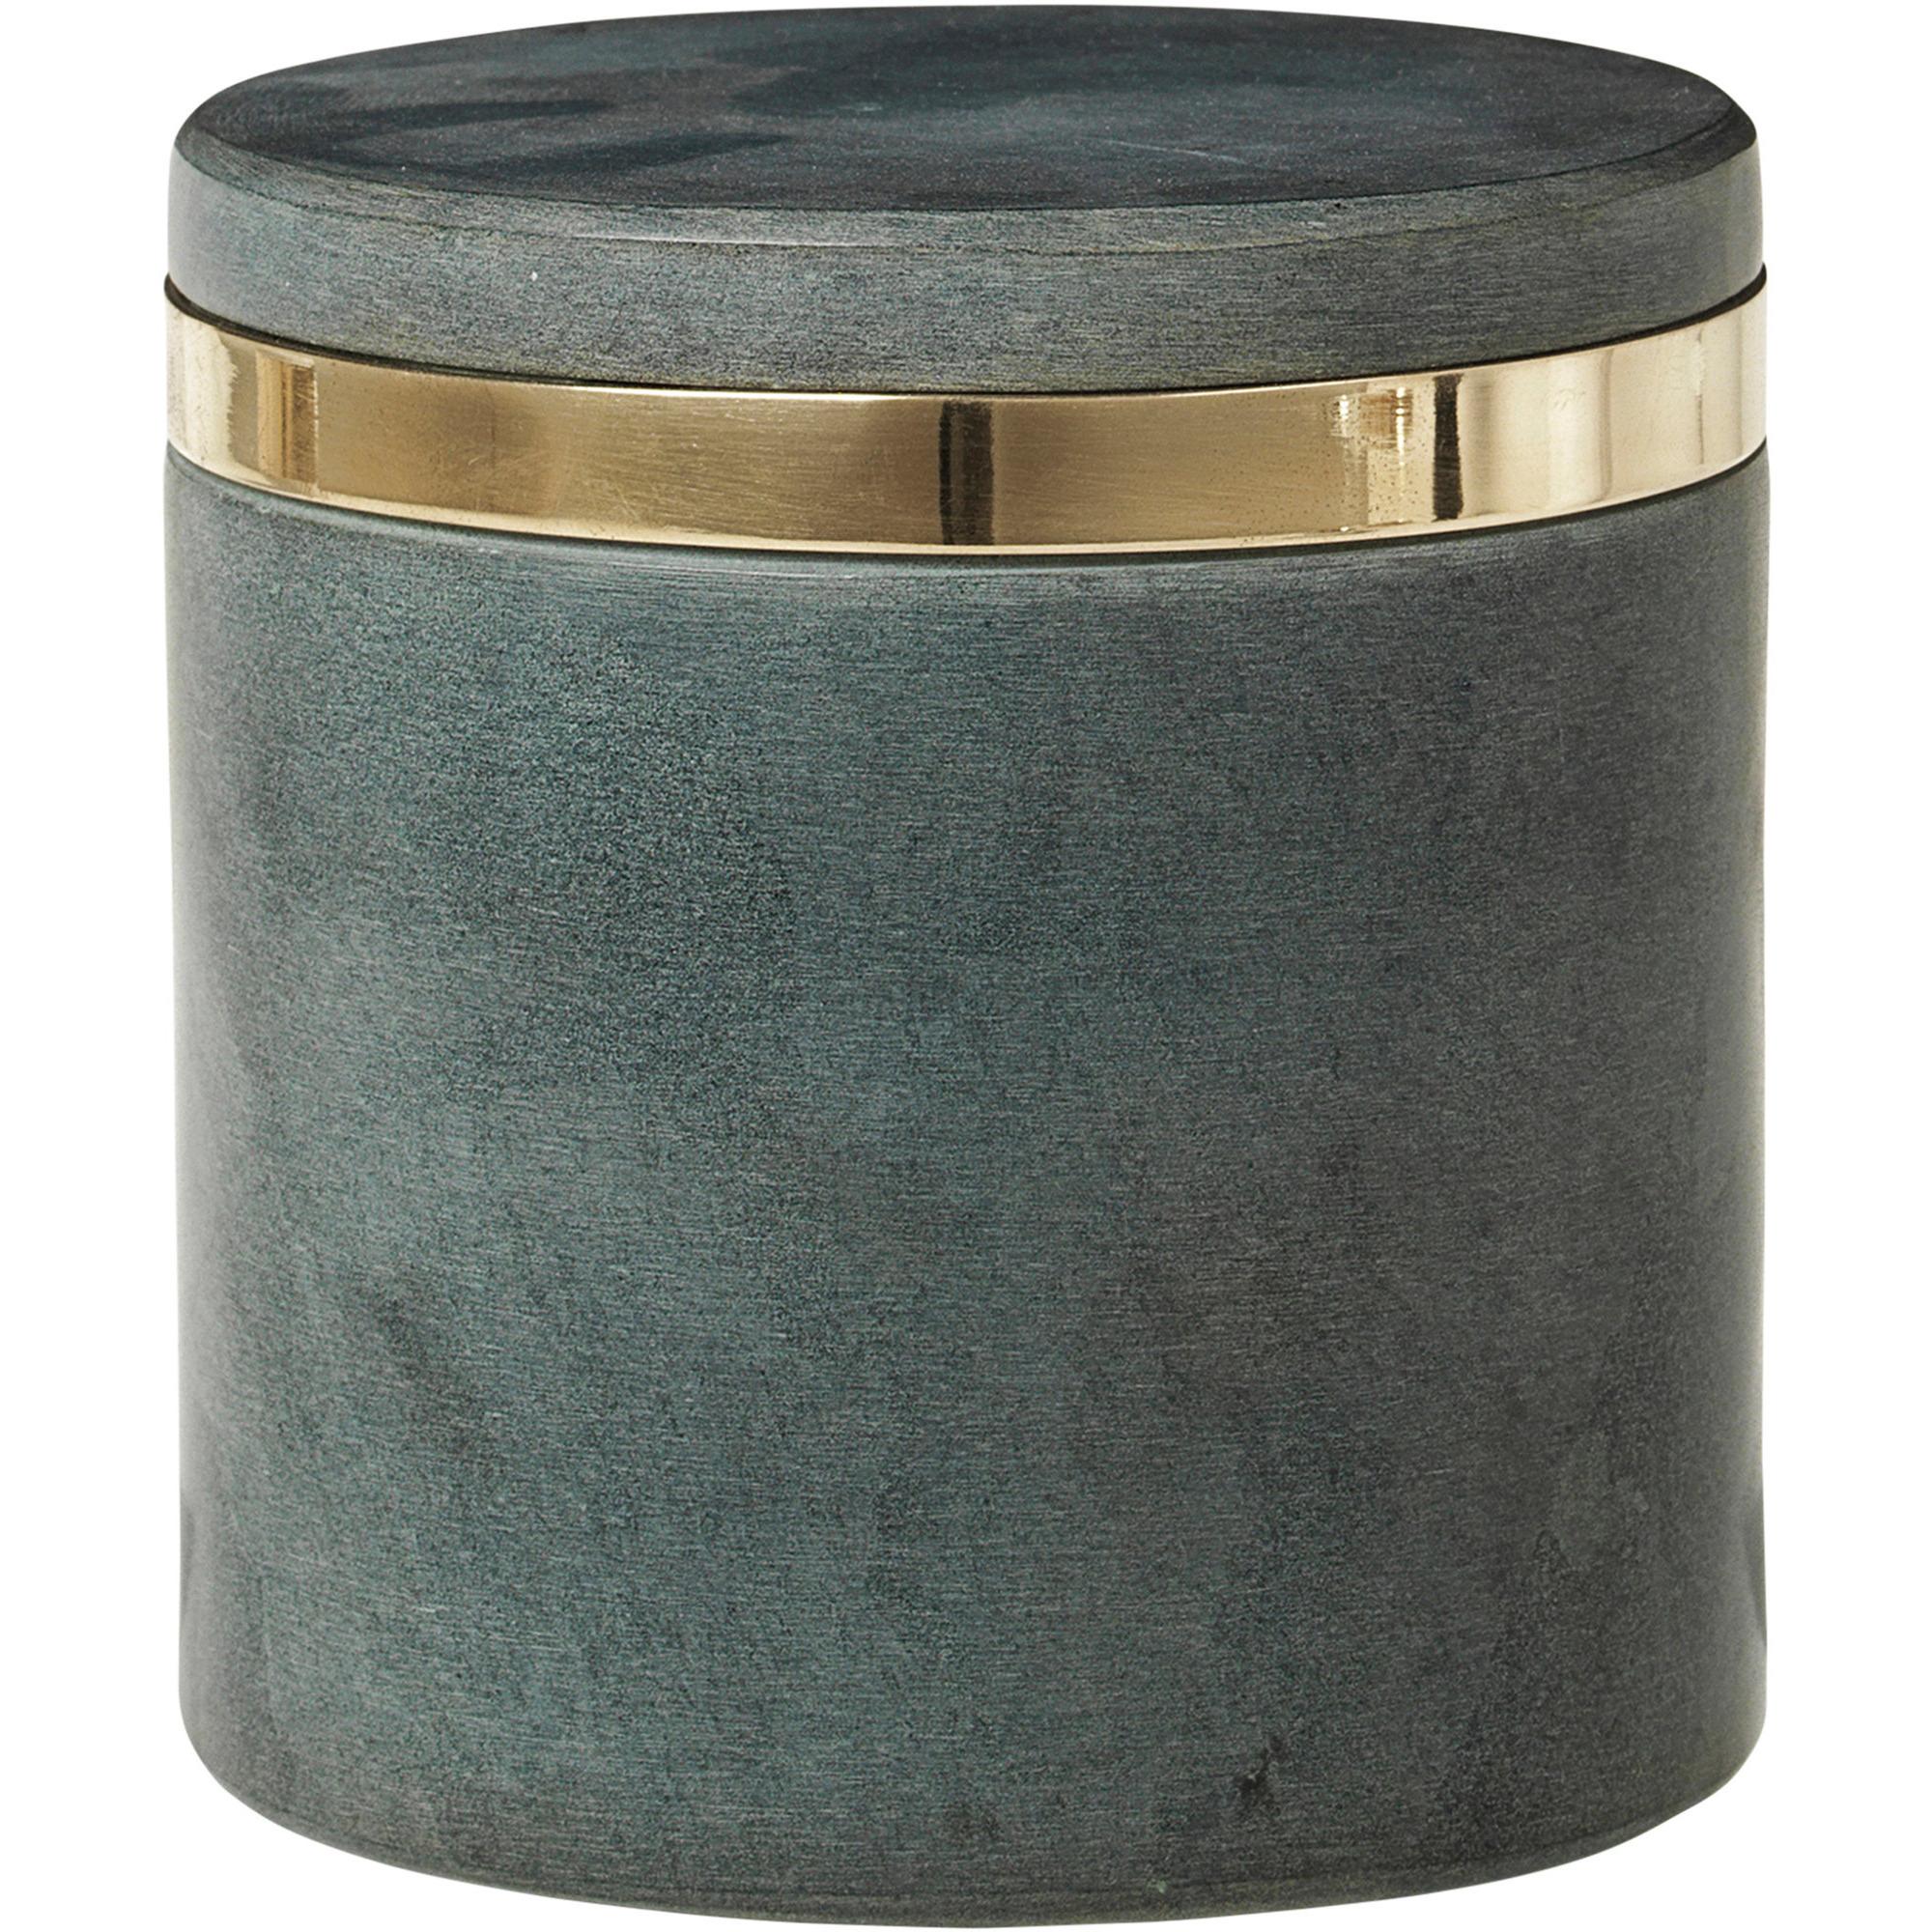 Broste Copenhagen Burk 'Ring' i färgen 'Soap Stone' S